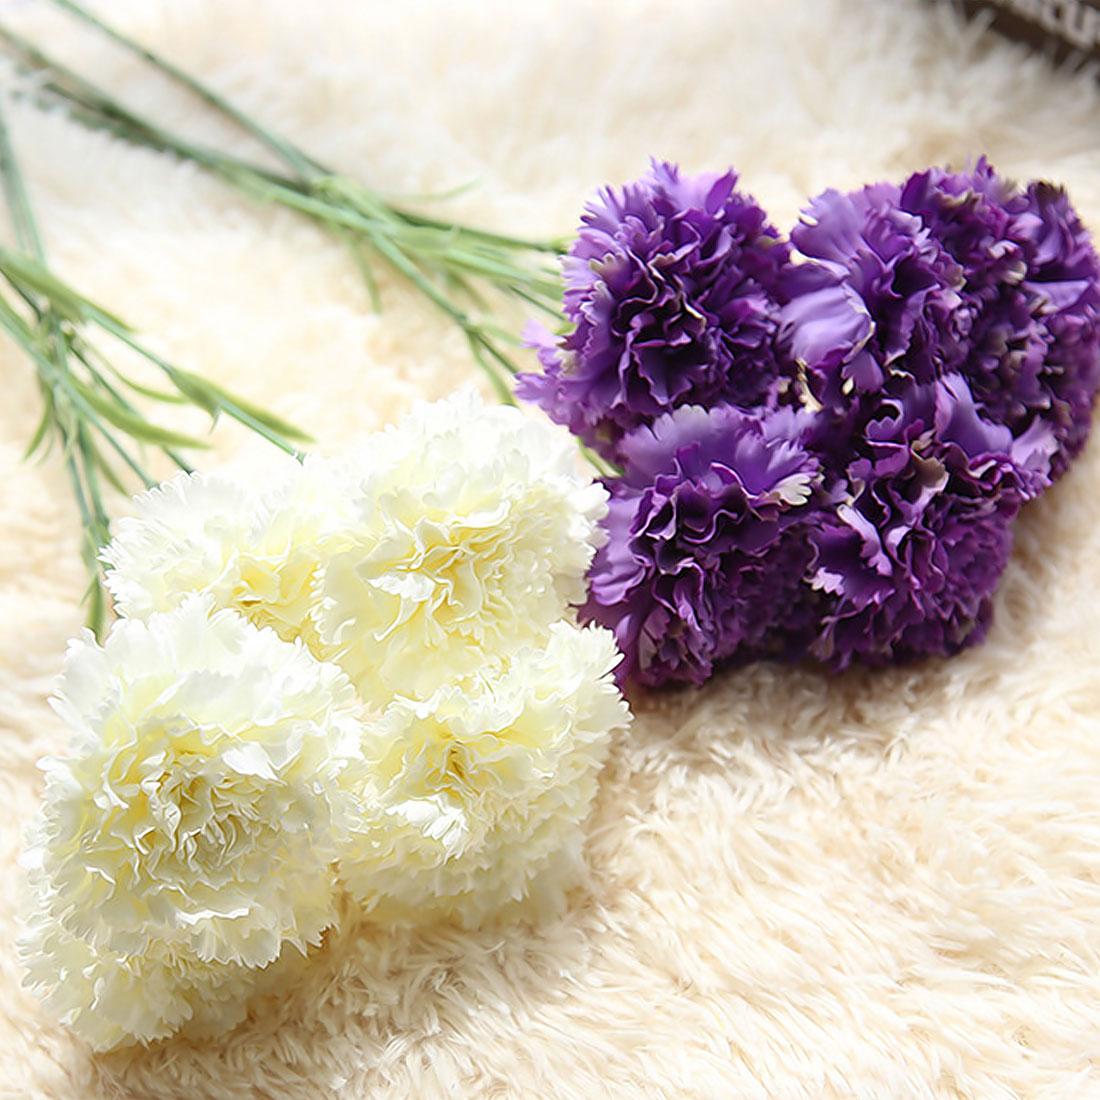 Fake Flowers 1pc Diy Fresh Artificial Flowers Carnation Silk Flower